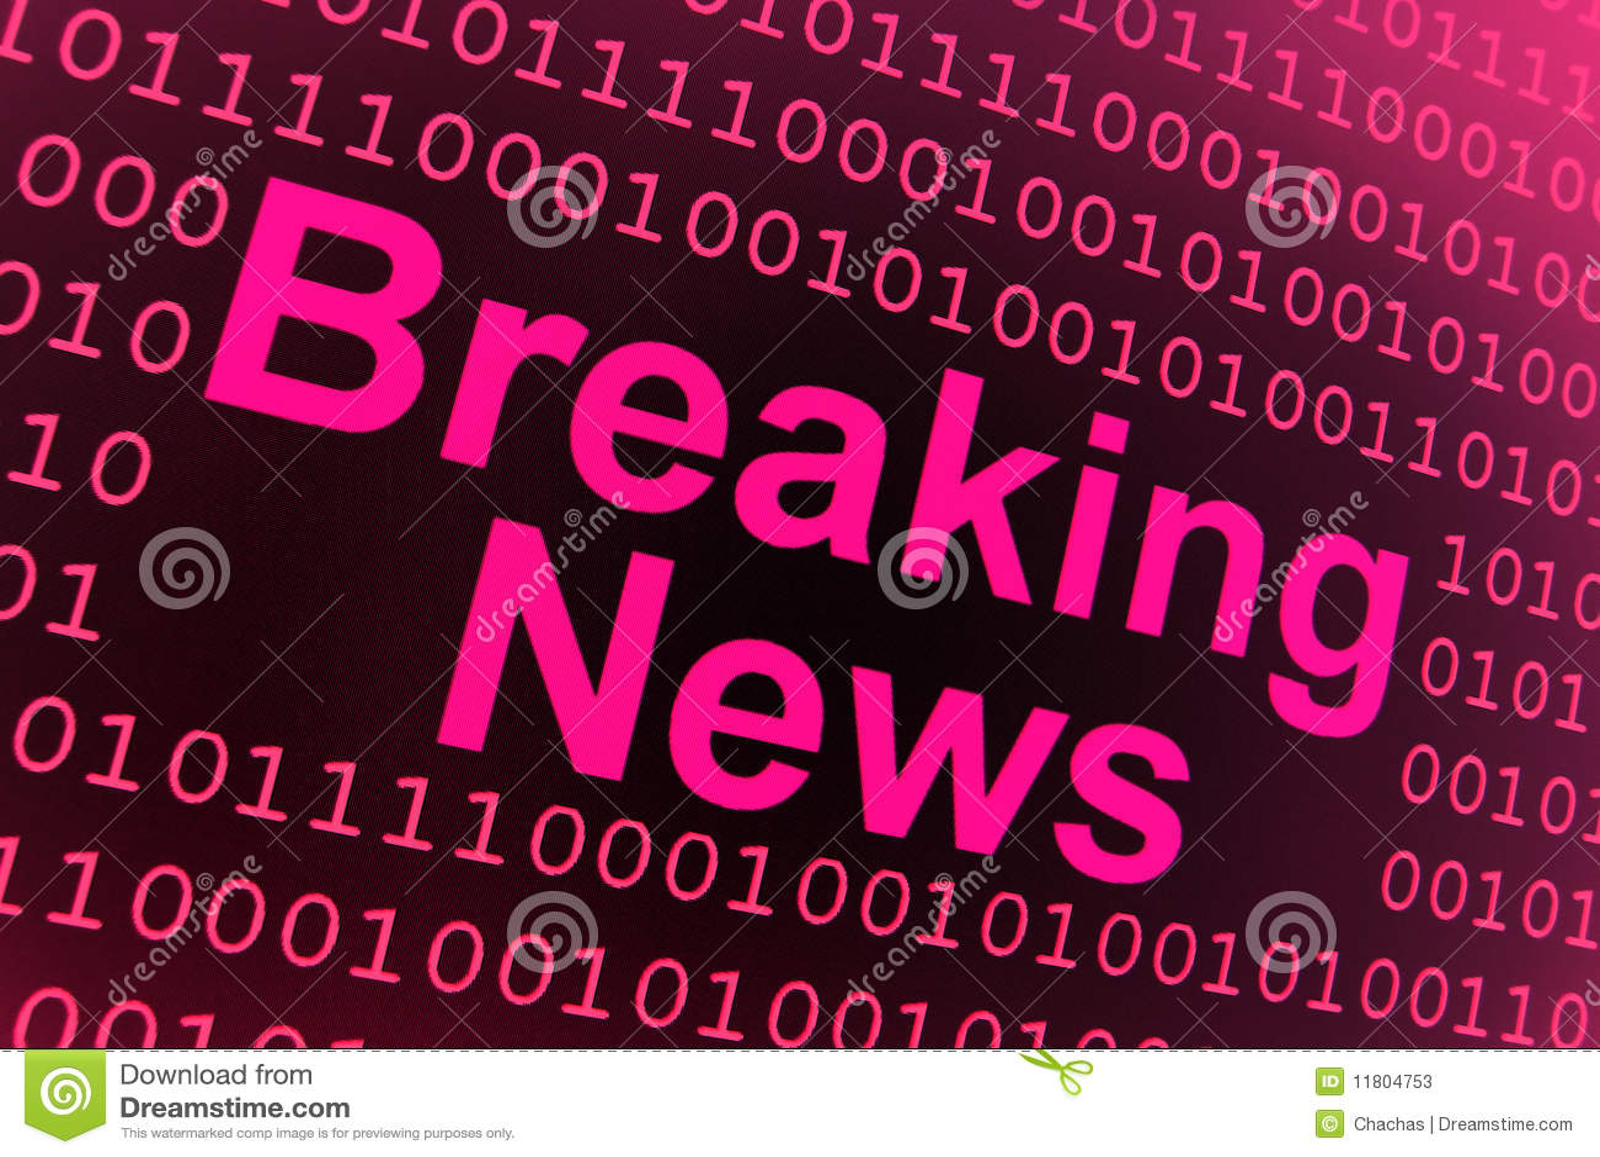 Breaking News Background Stock Photos - Image: 11804753